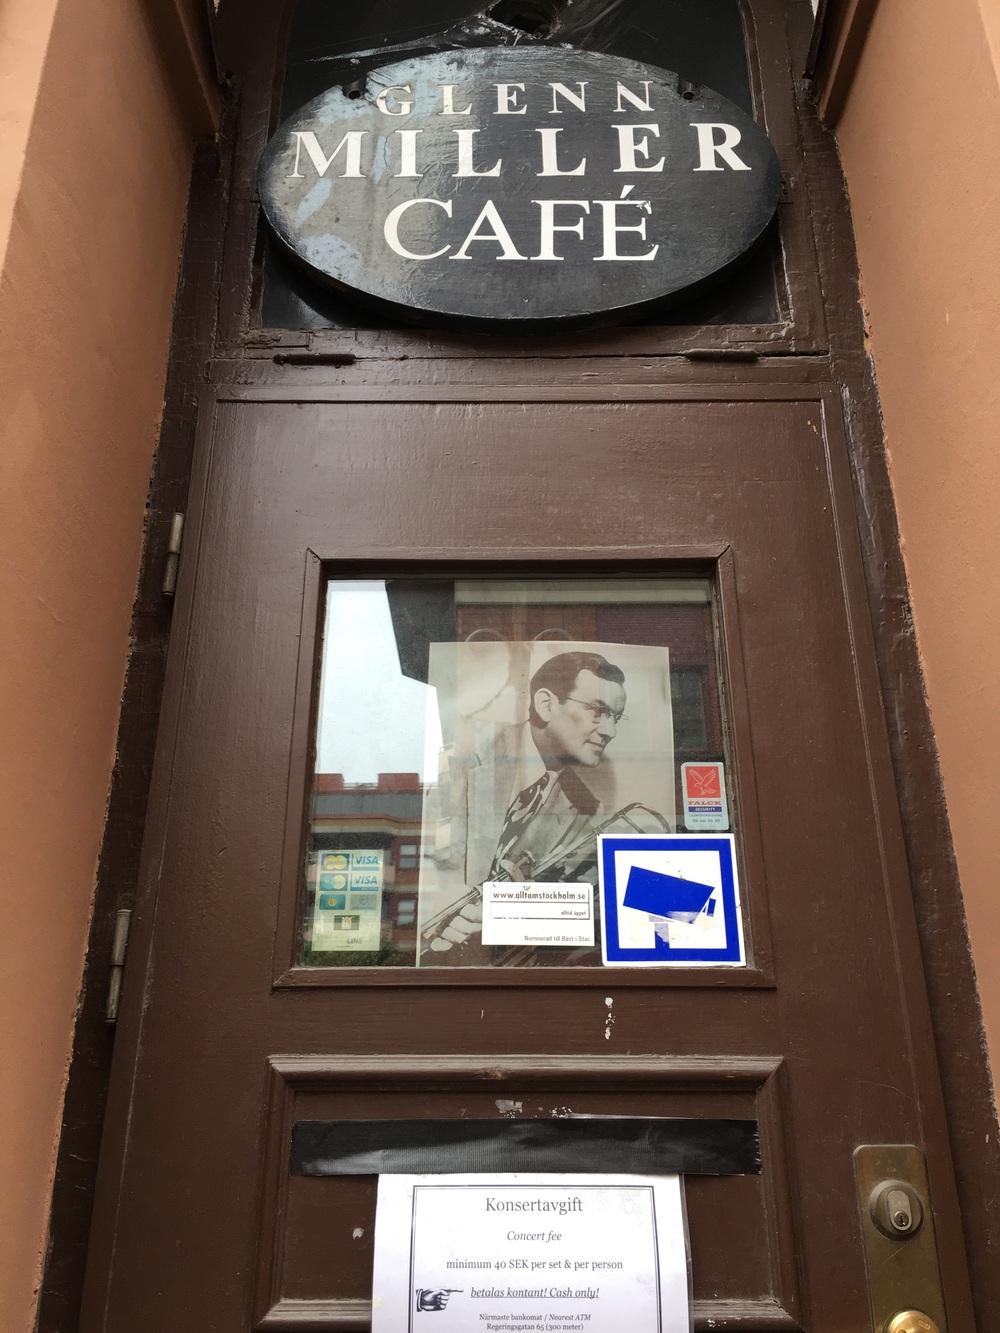 Glenn Miller Café, Stockhoolm